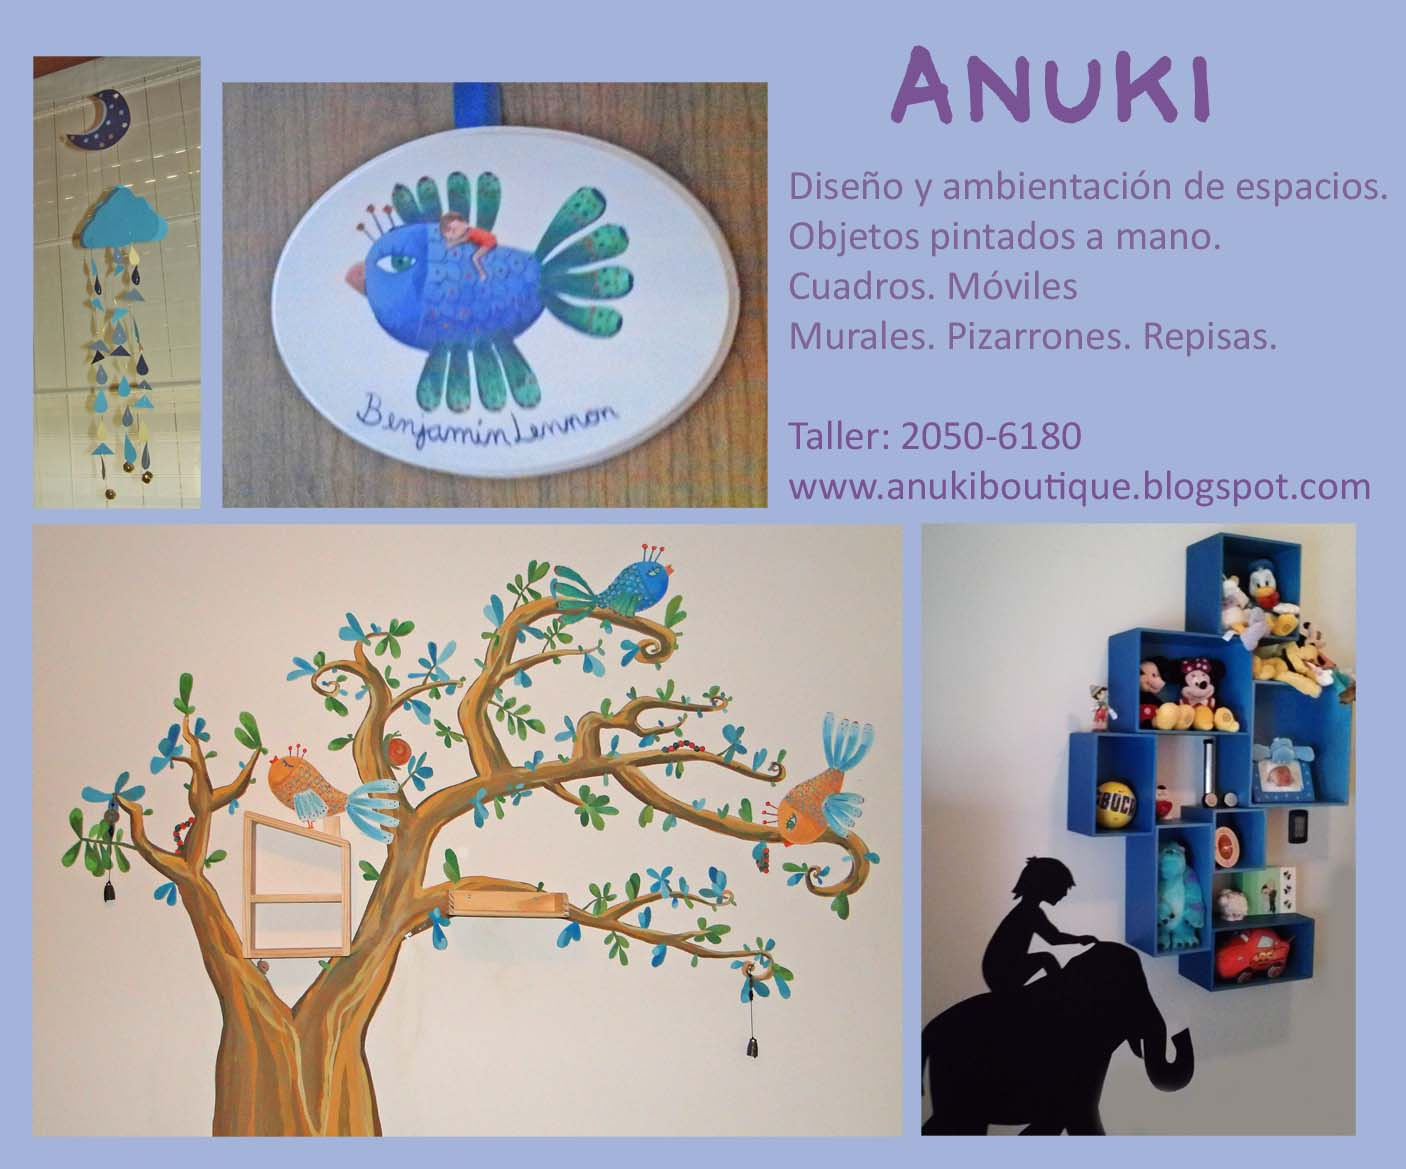 Anuki boutique dise o de habitaciones infantiles for Diseno de habitaciones infantiles